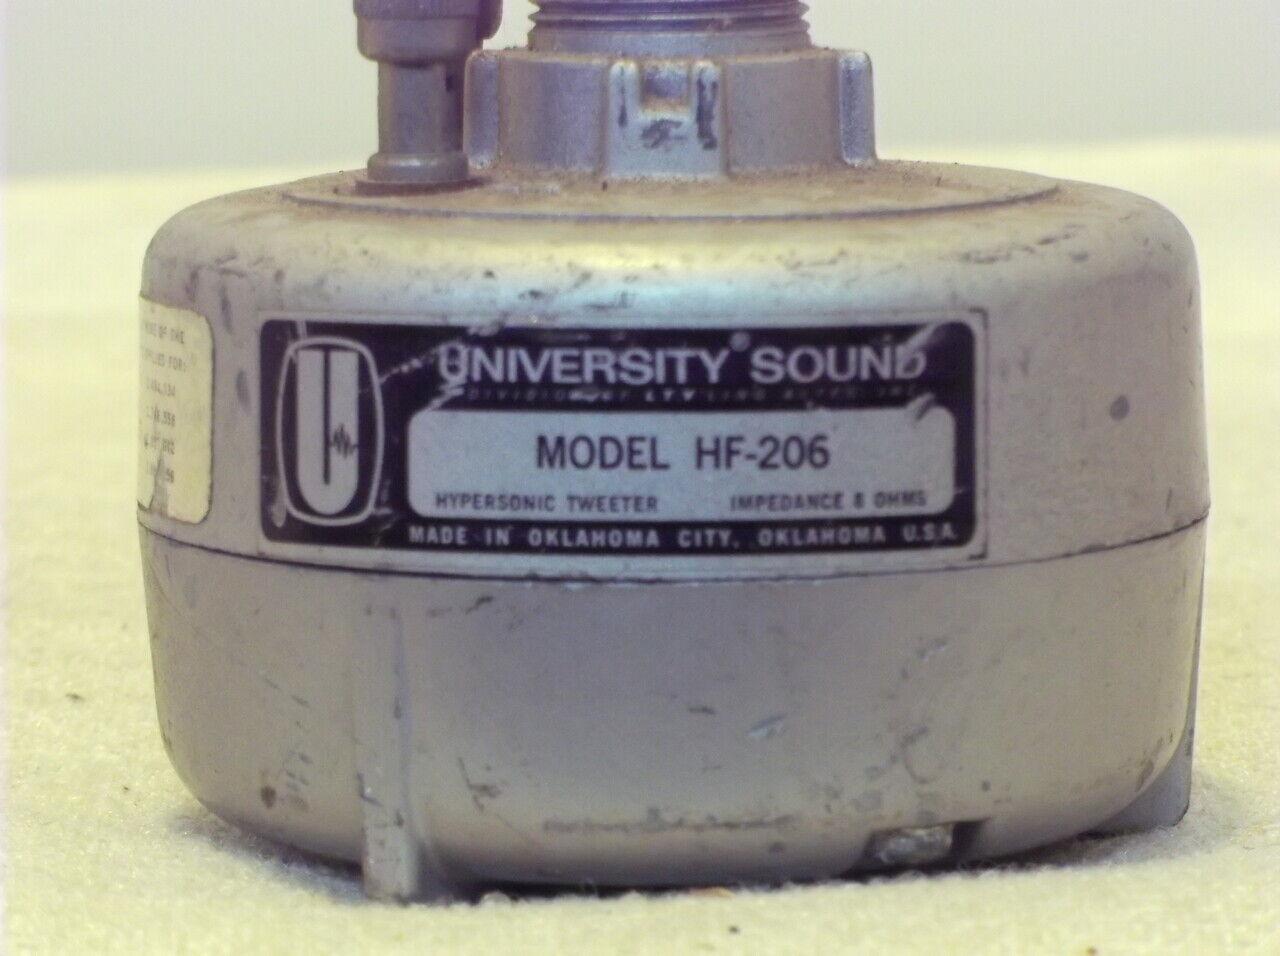 University Sound, 8 Ohm Hypersonic Tweeter, P N HF-206